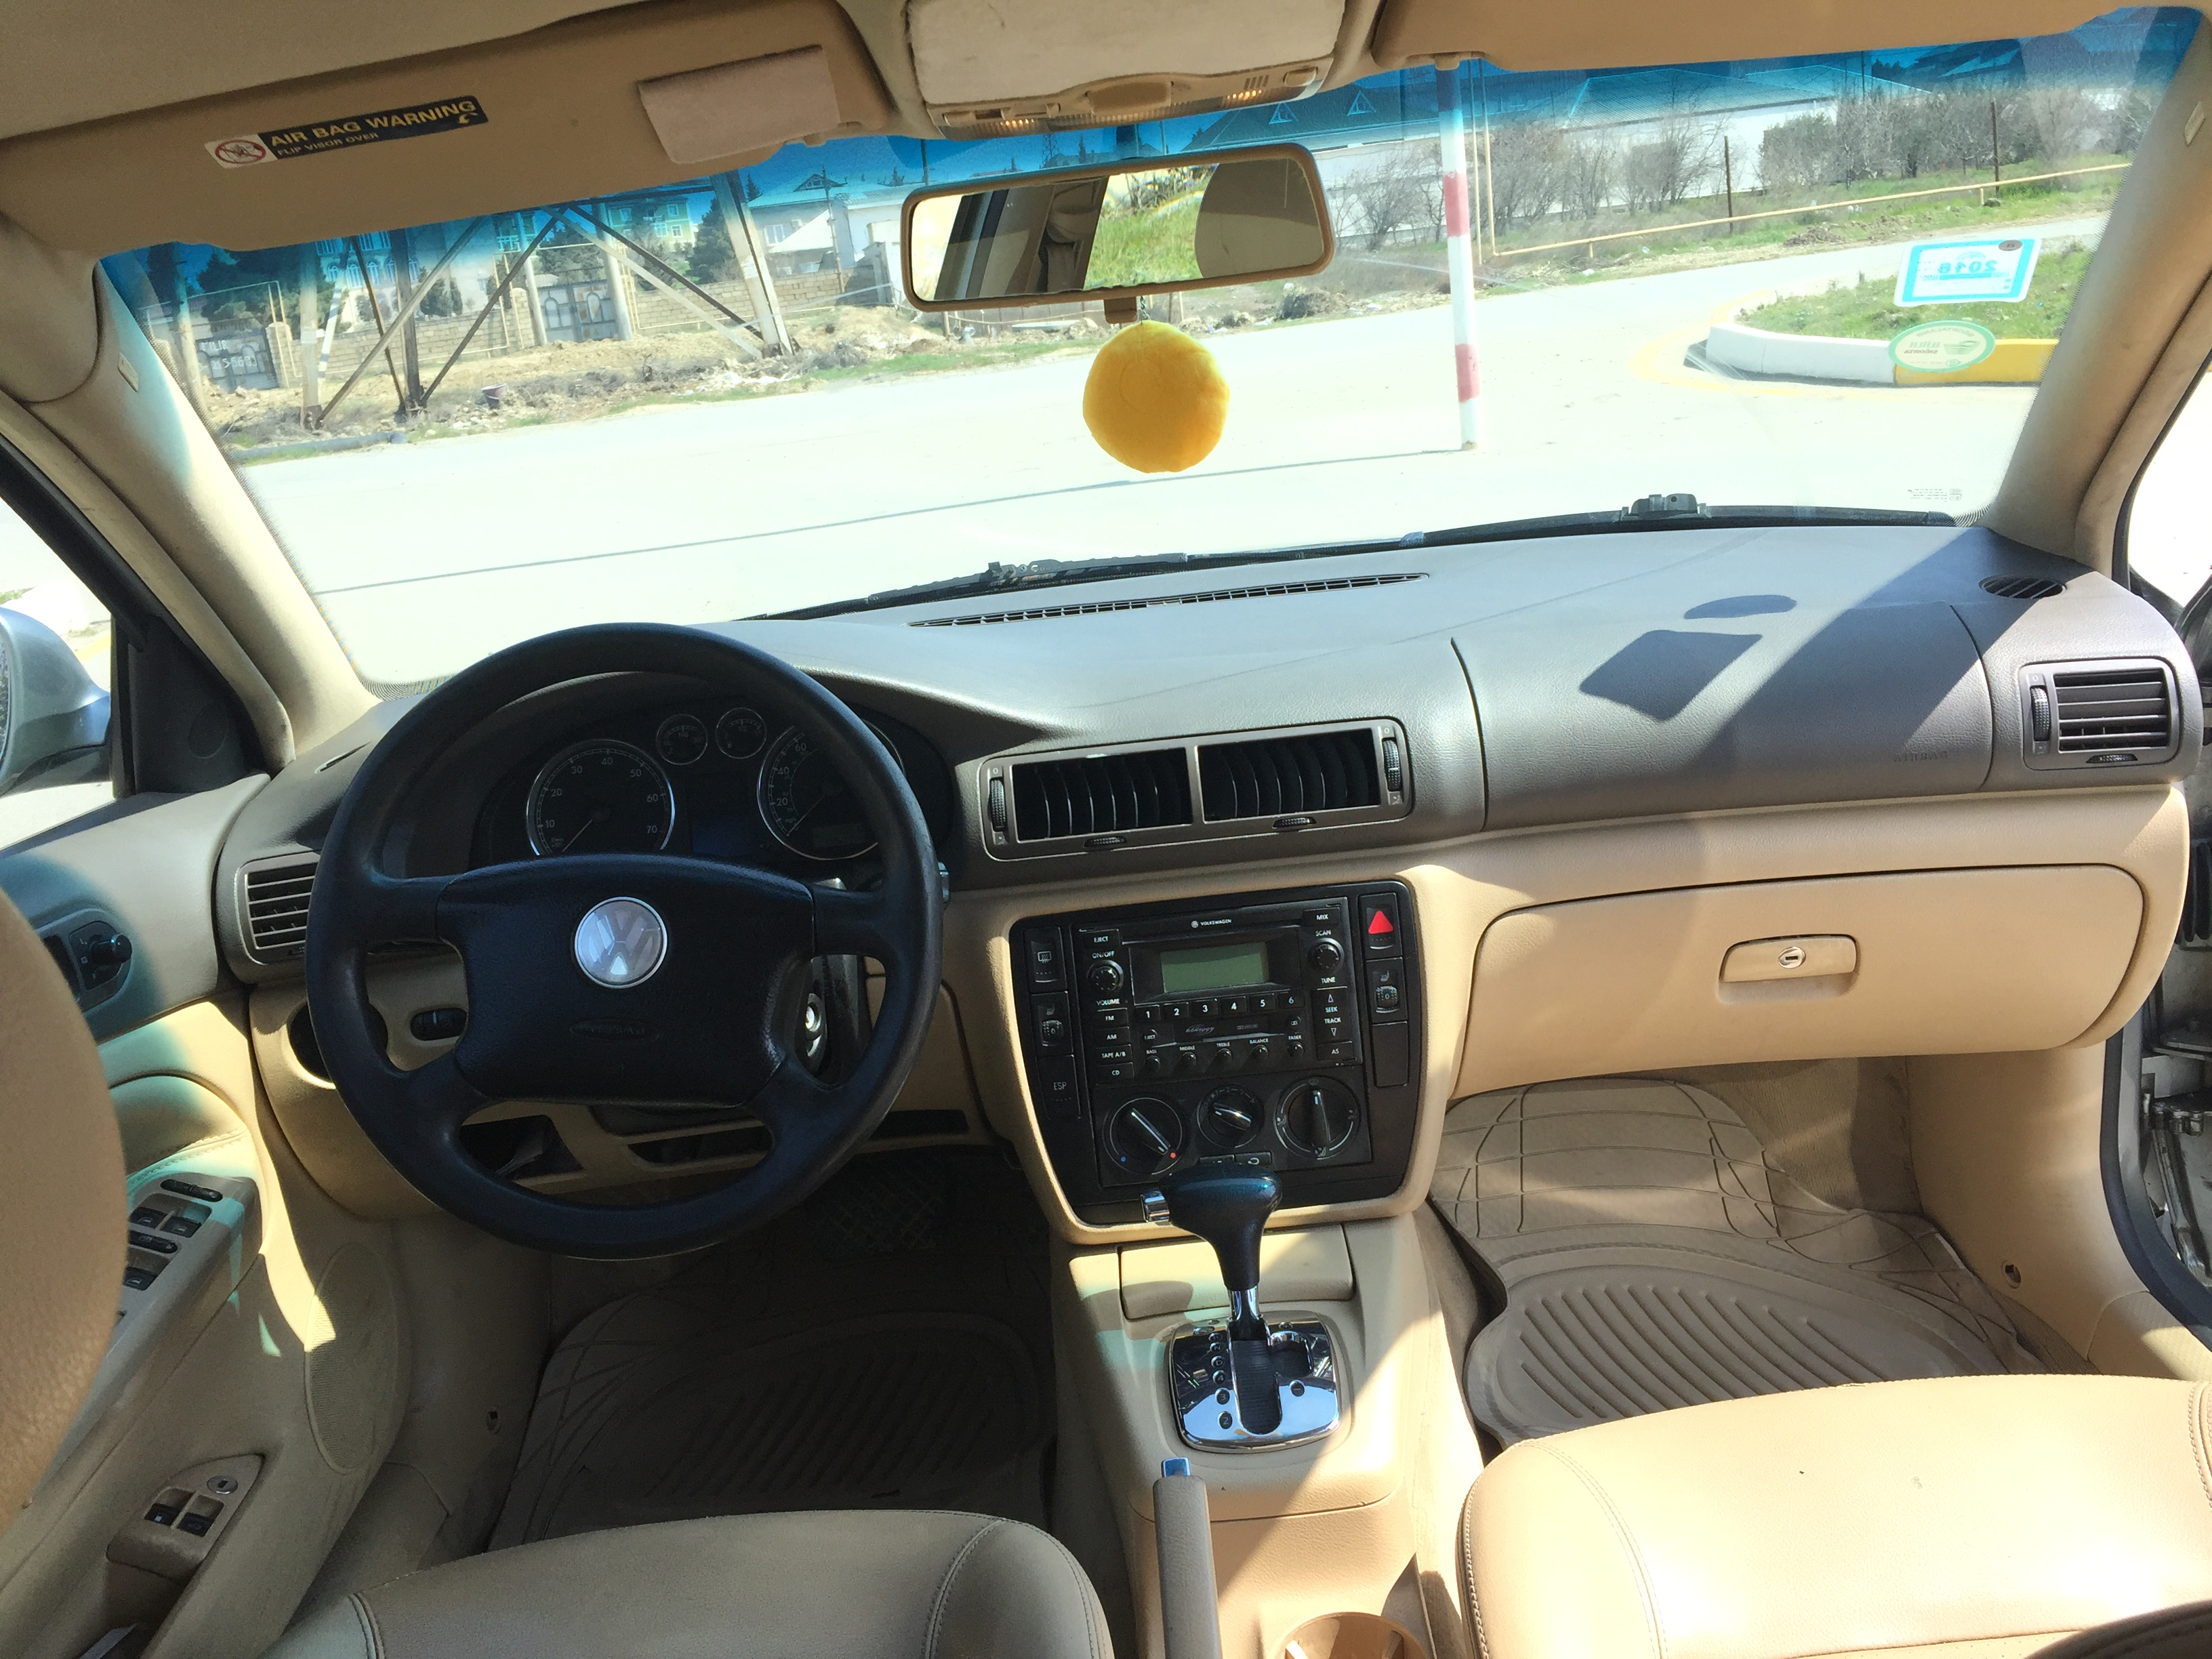 Volkswagen Passat 1.8(lt) 2004 Подержанный  $4800